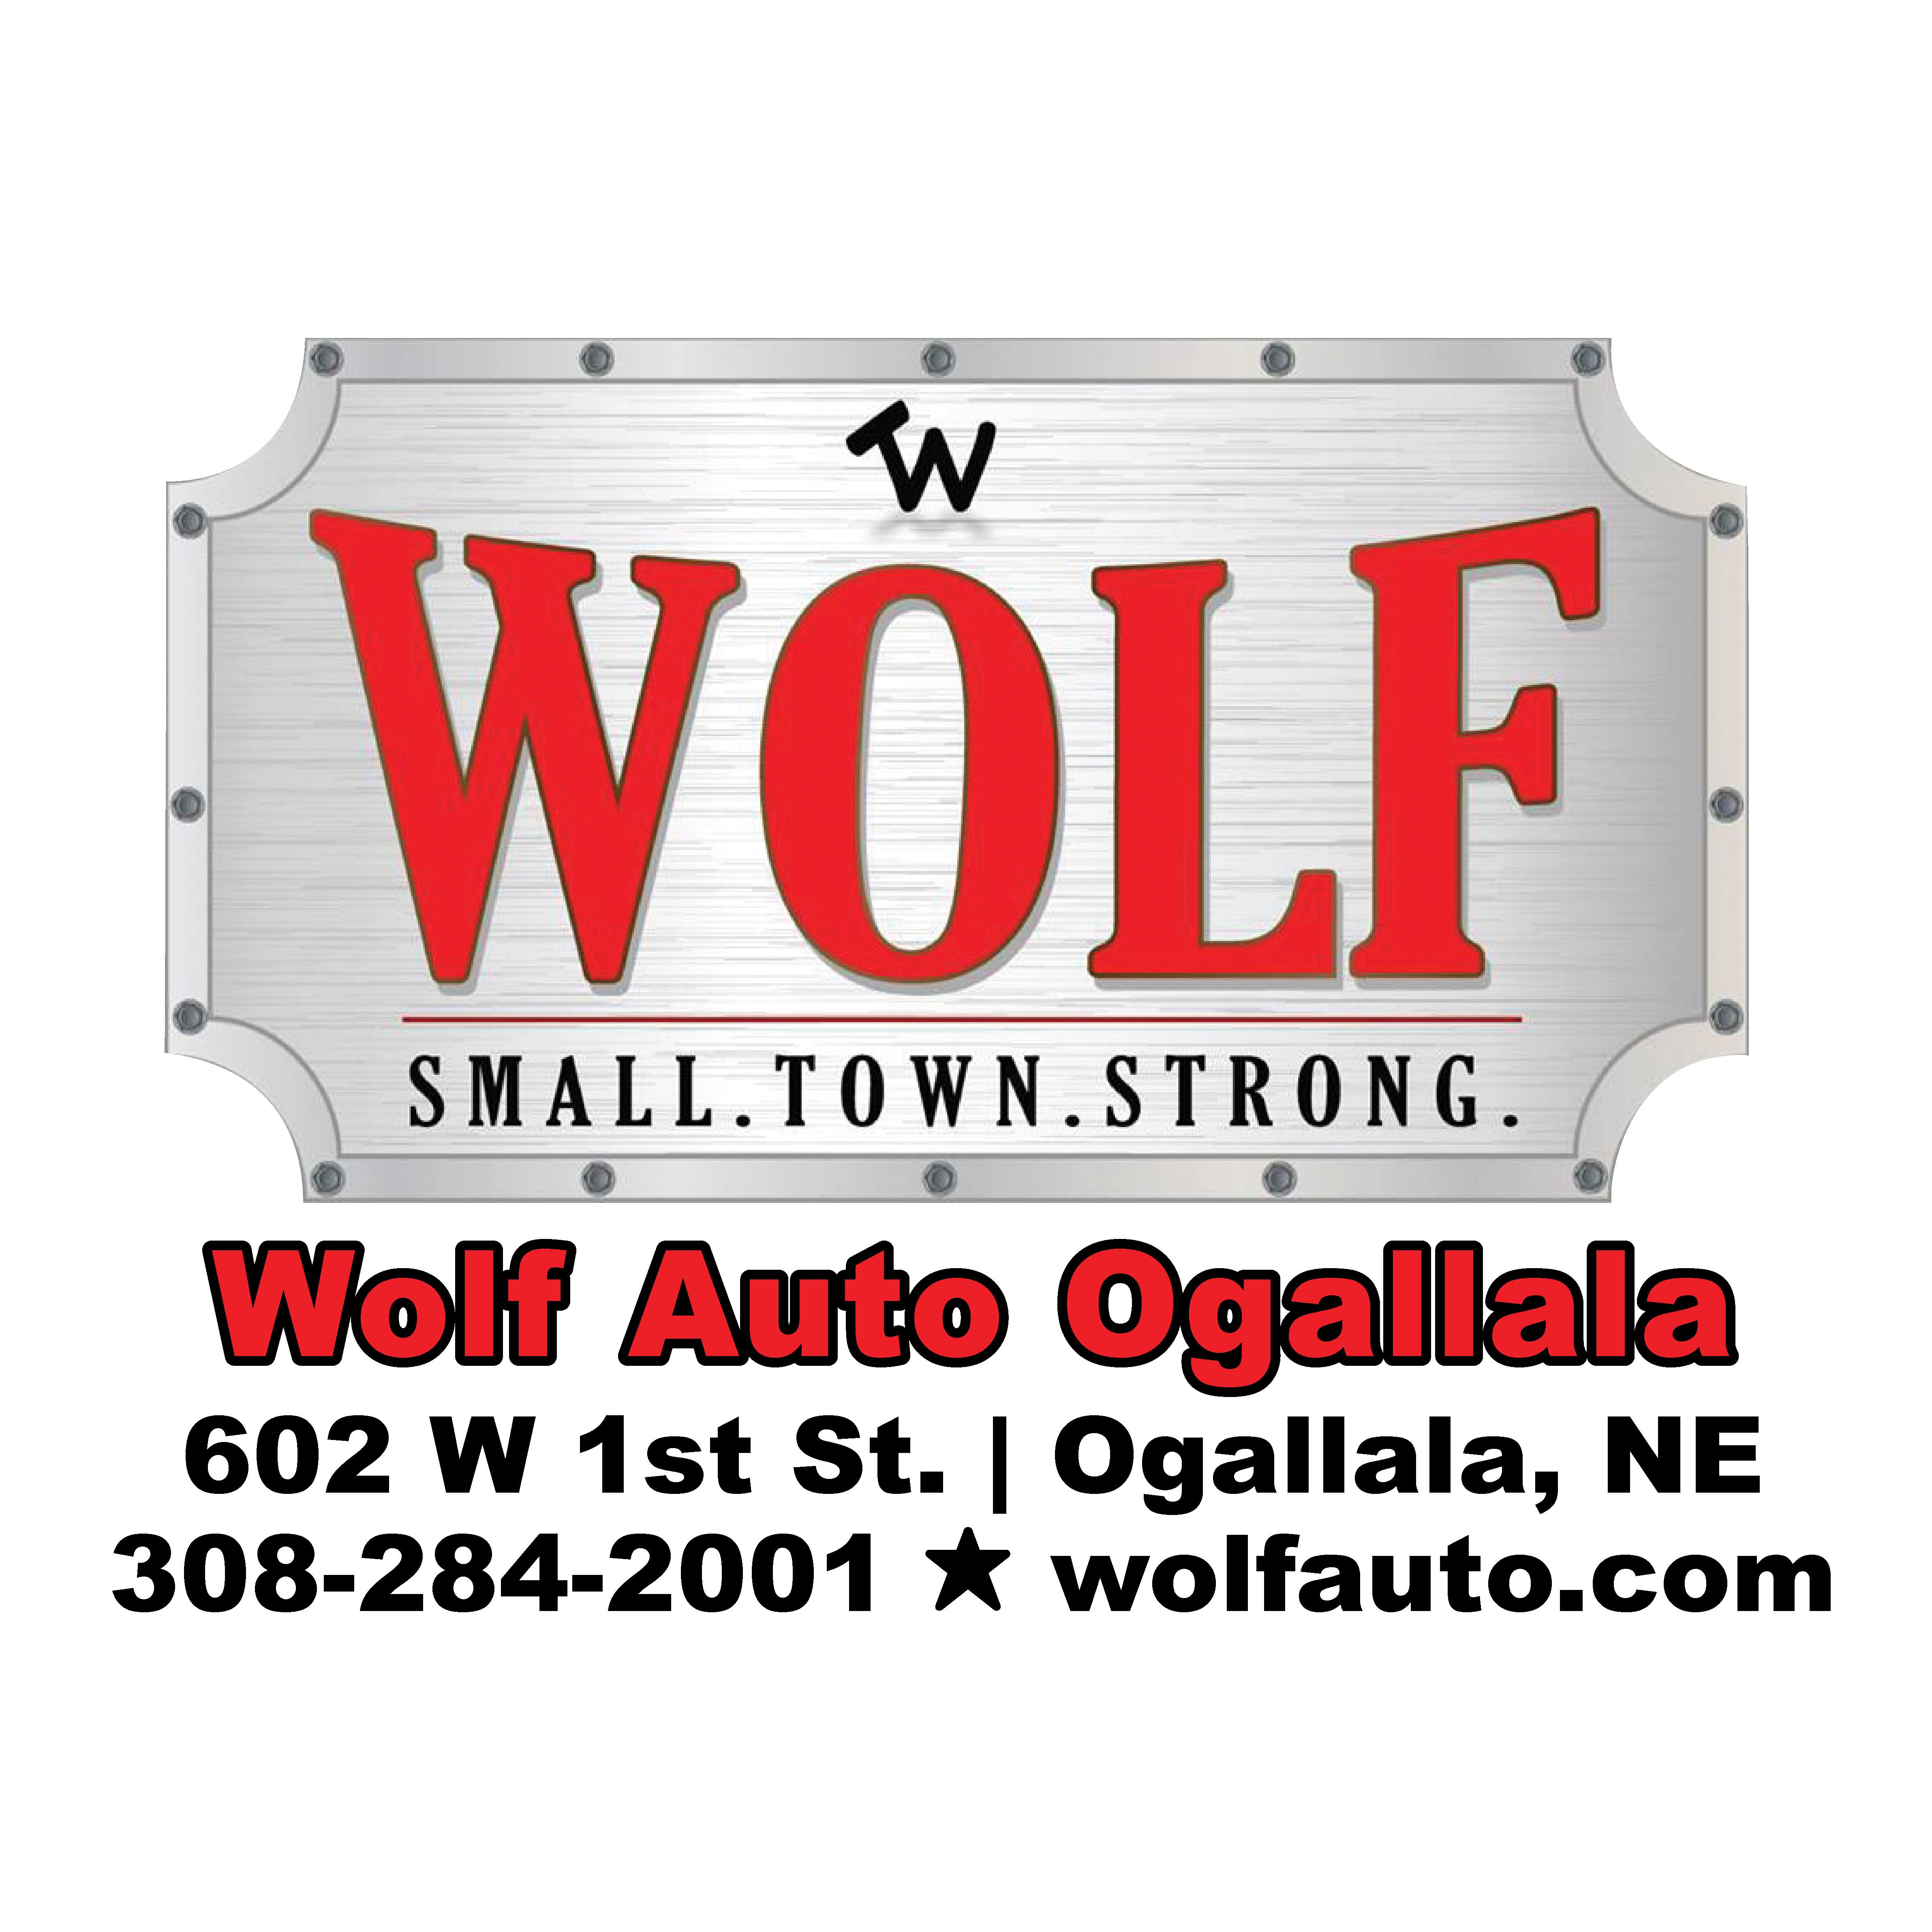 Wolf Auto Ogallala image 2